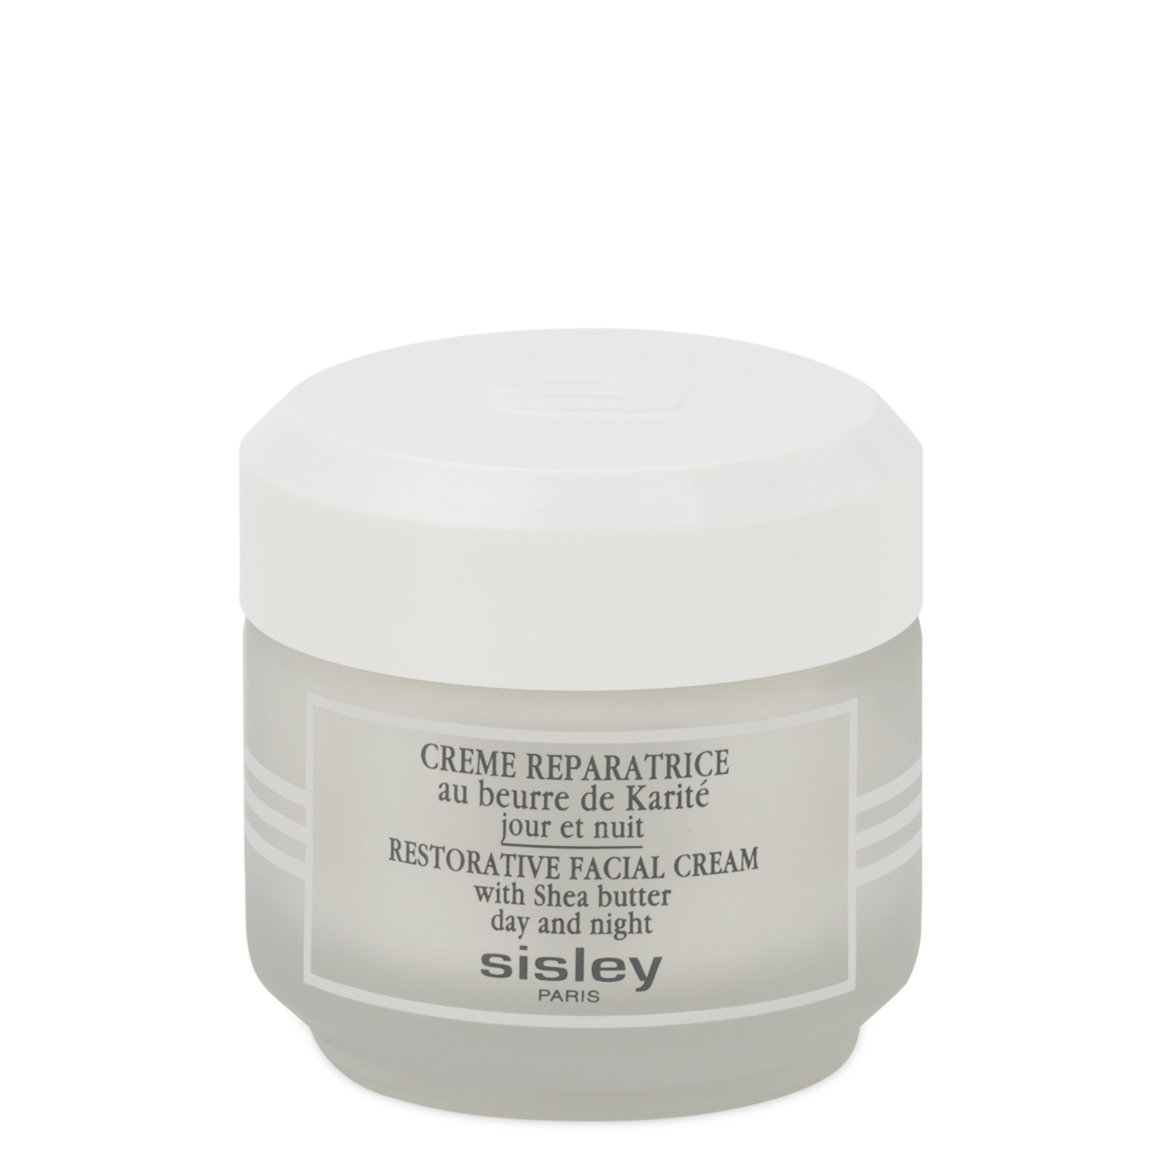 Sisley-Paris Restorative Facial Cream product swatch.